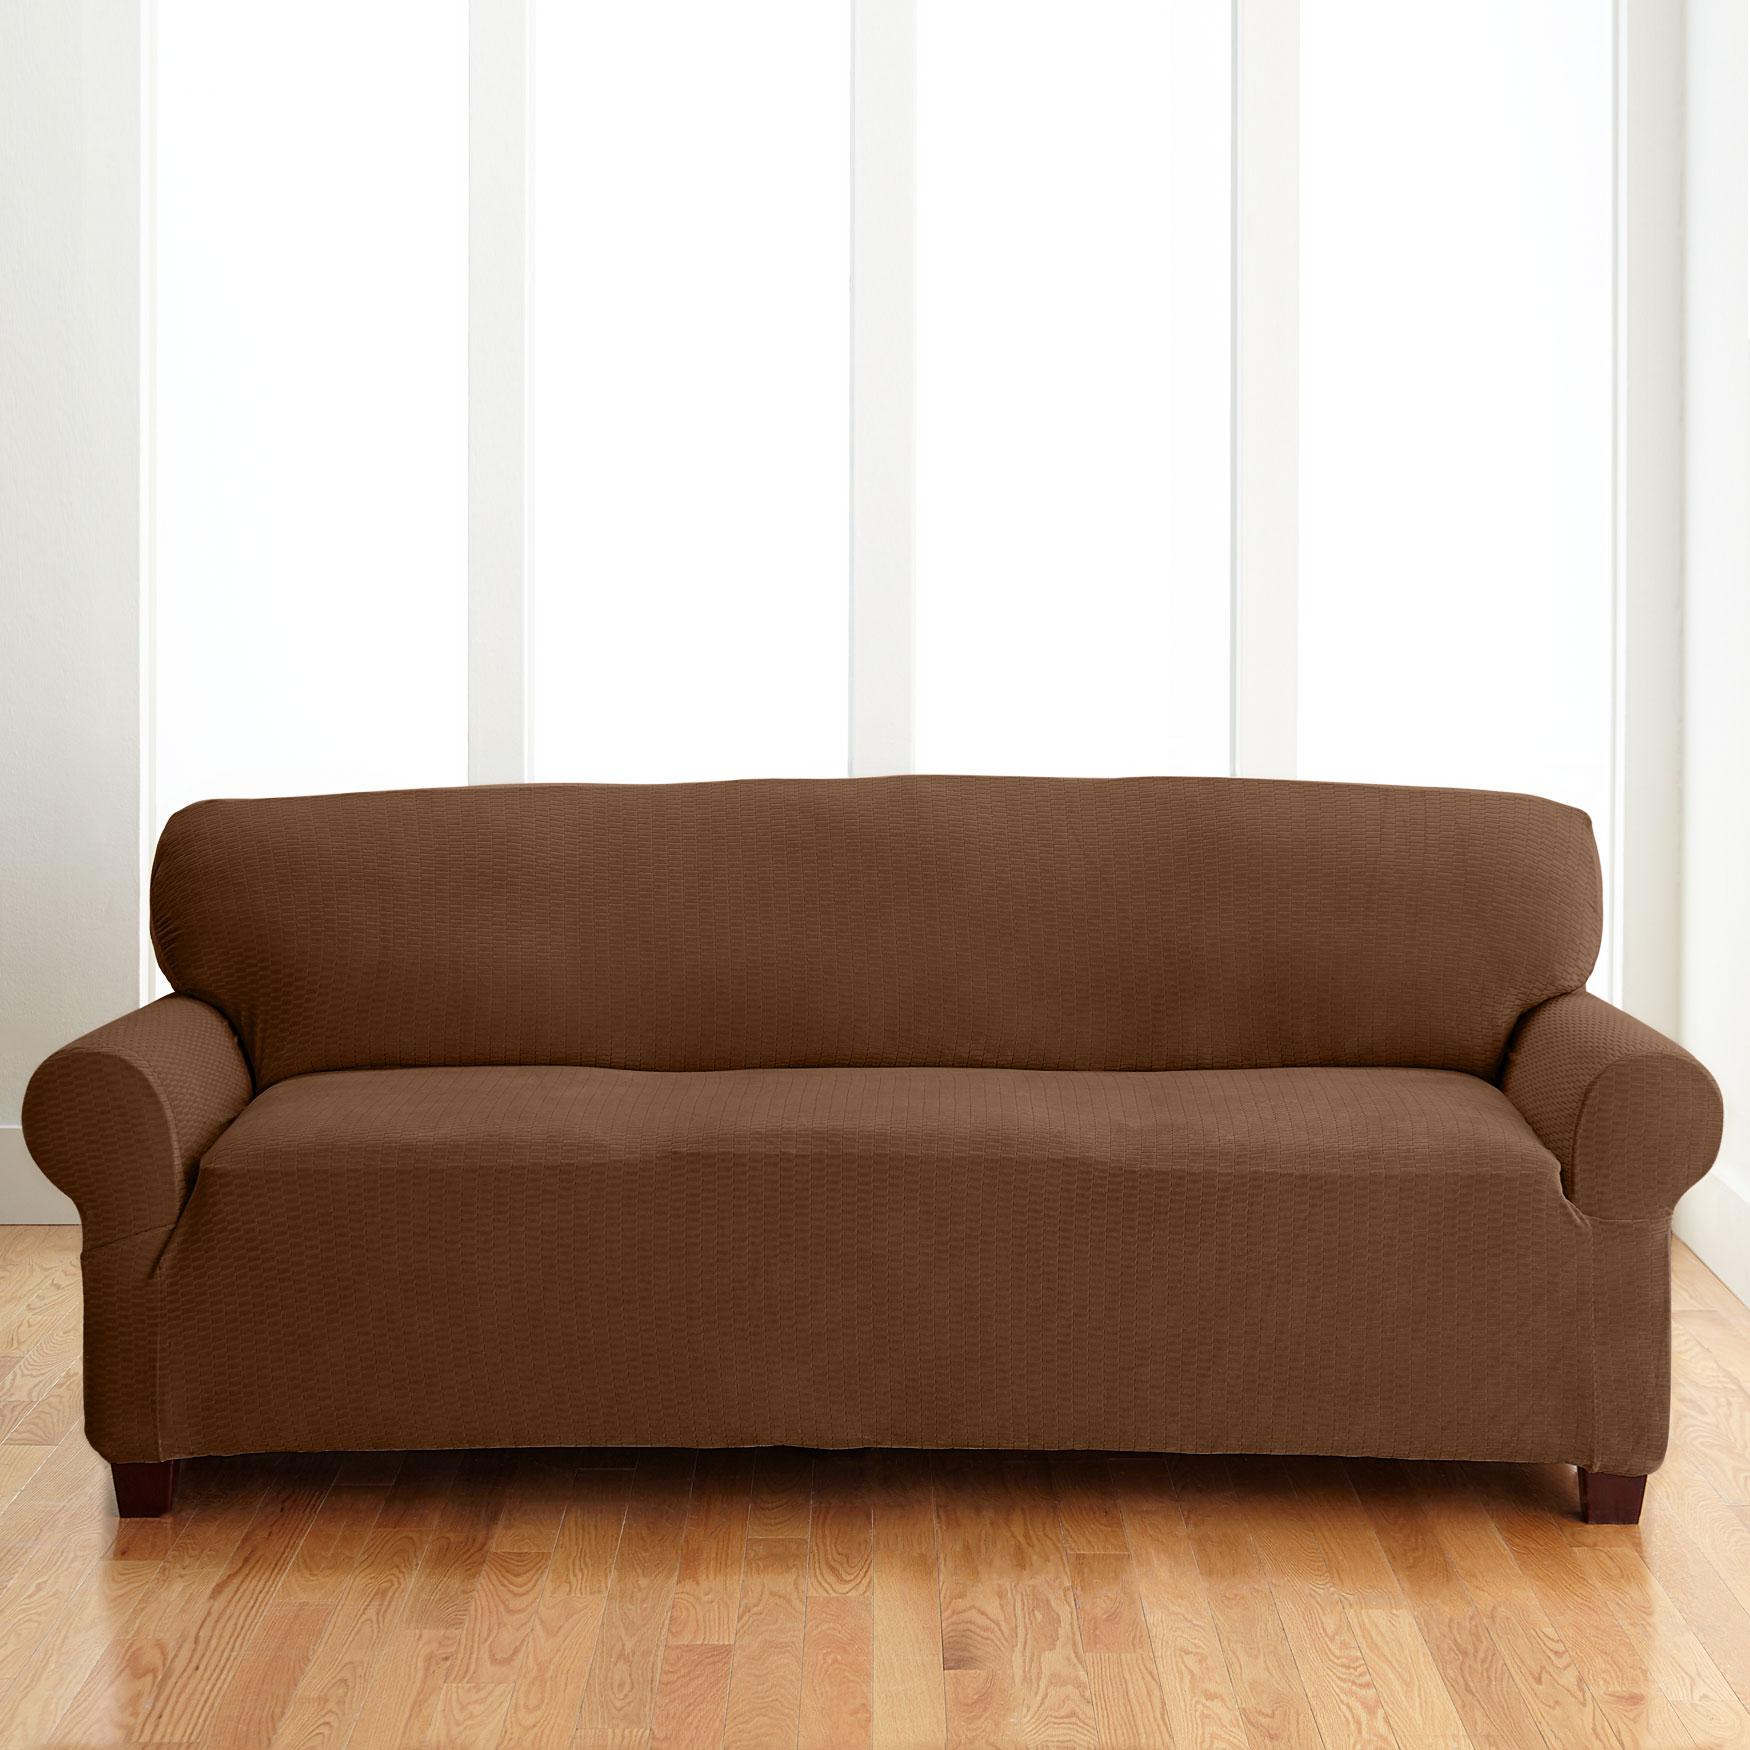 extra long sofa slipcover latex foam bed bh studio brighton plus size